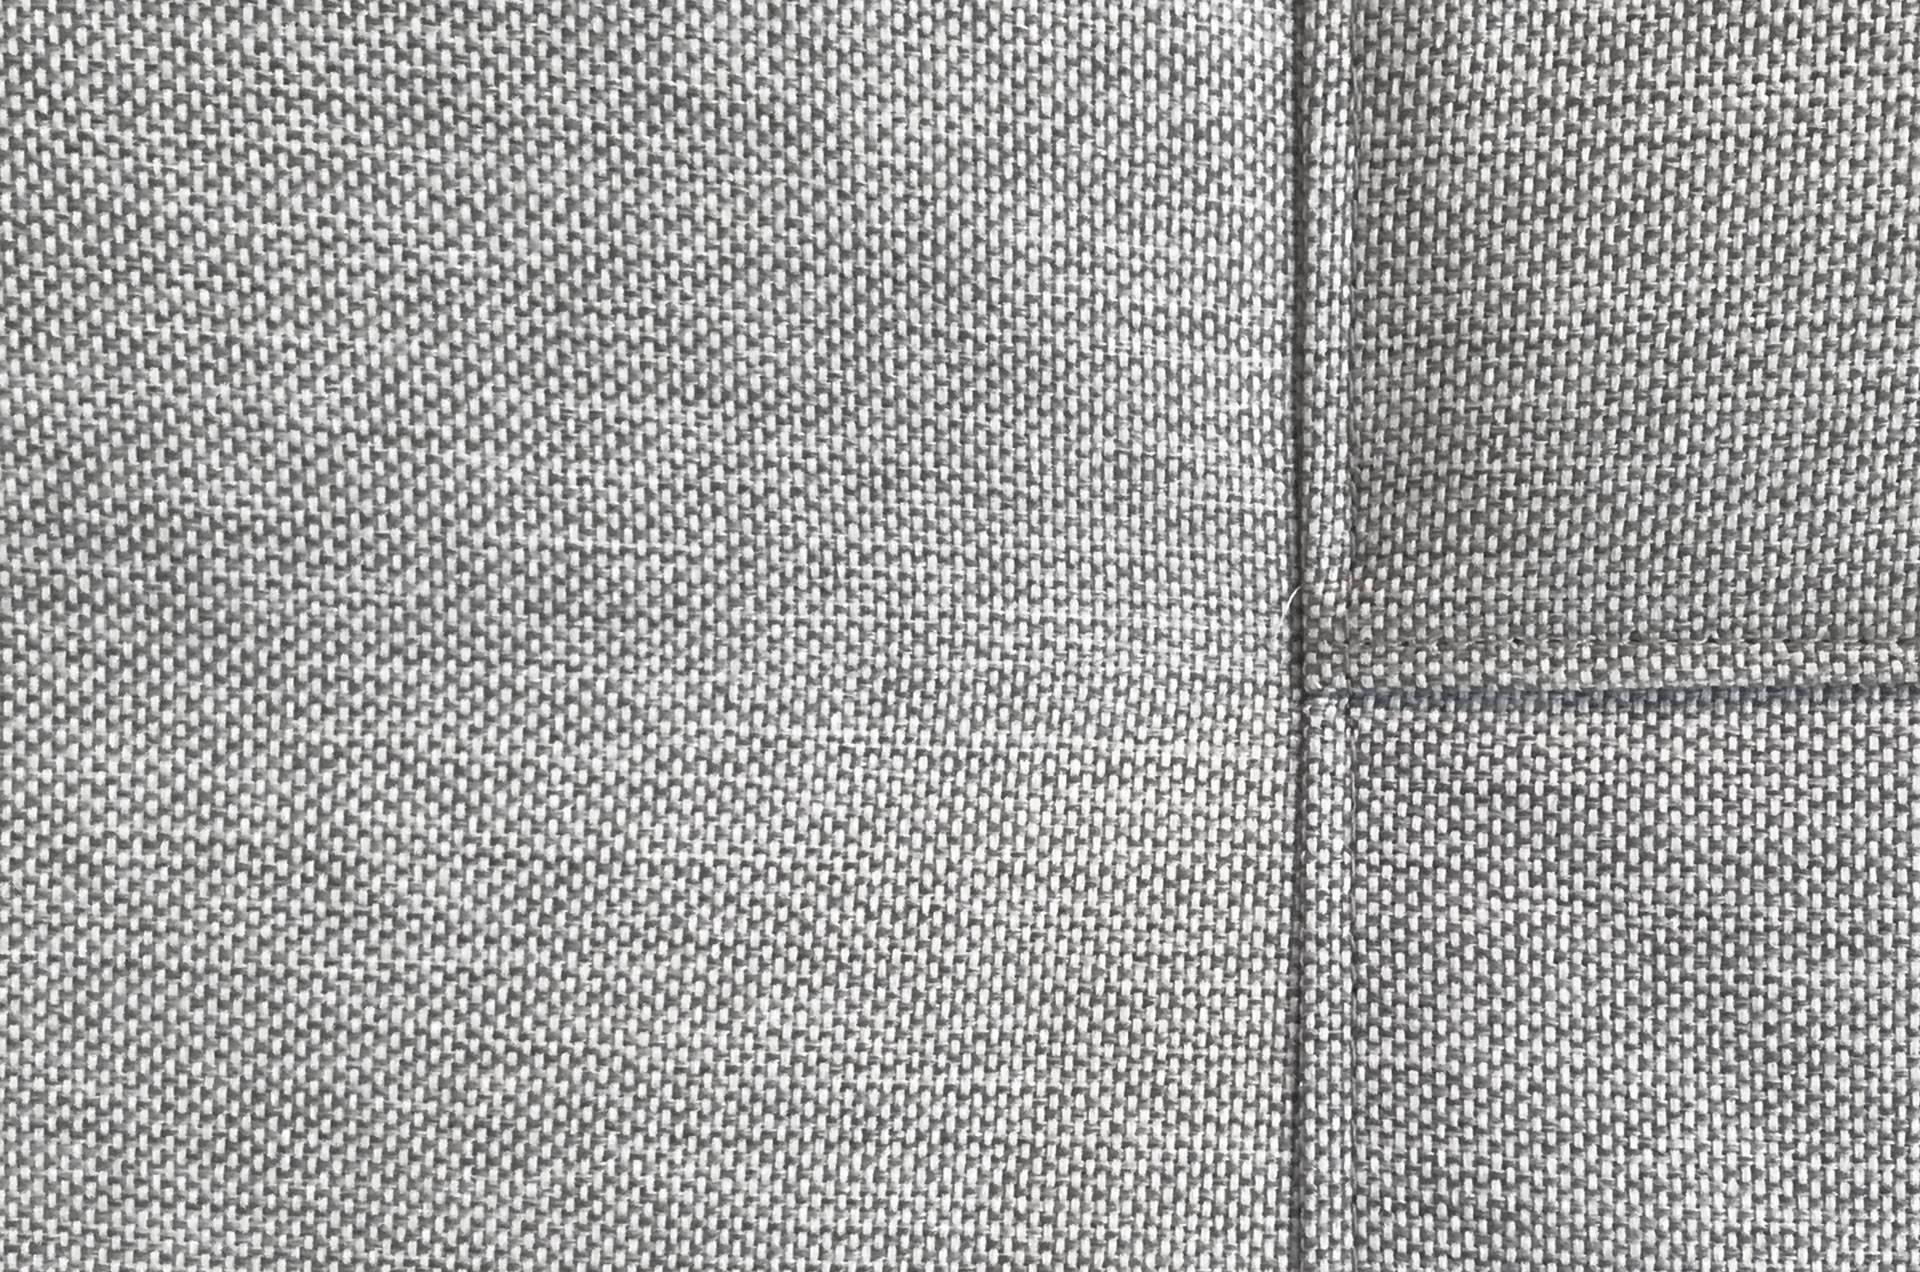 Fabric sofa material